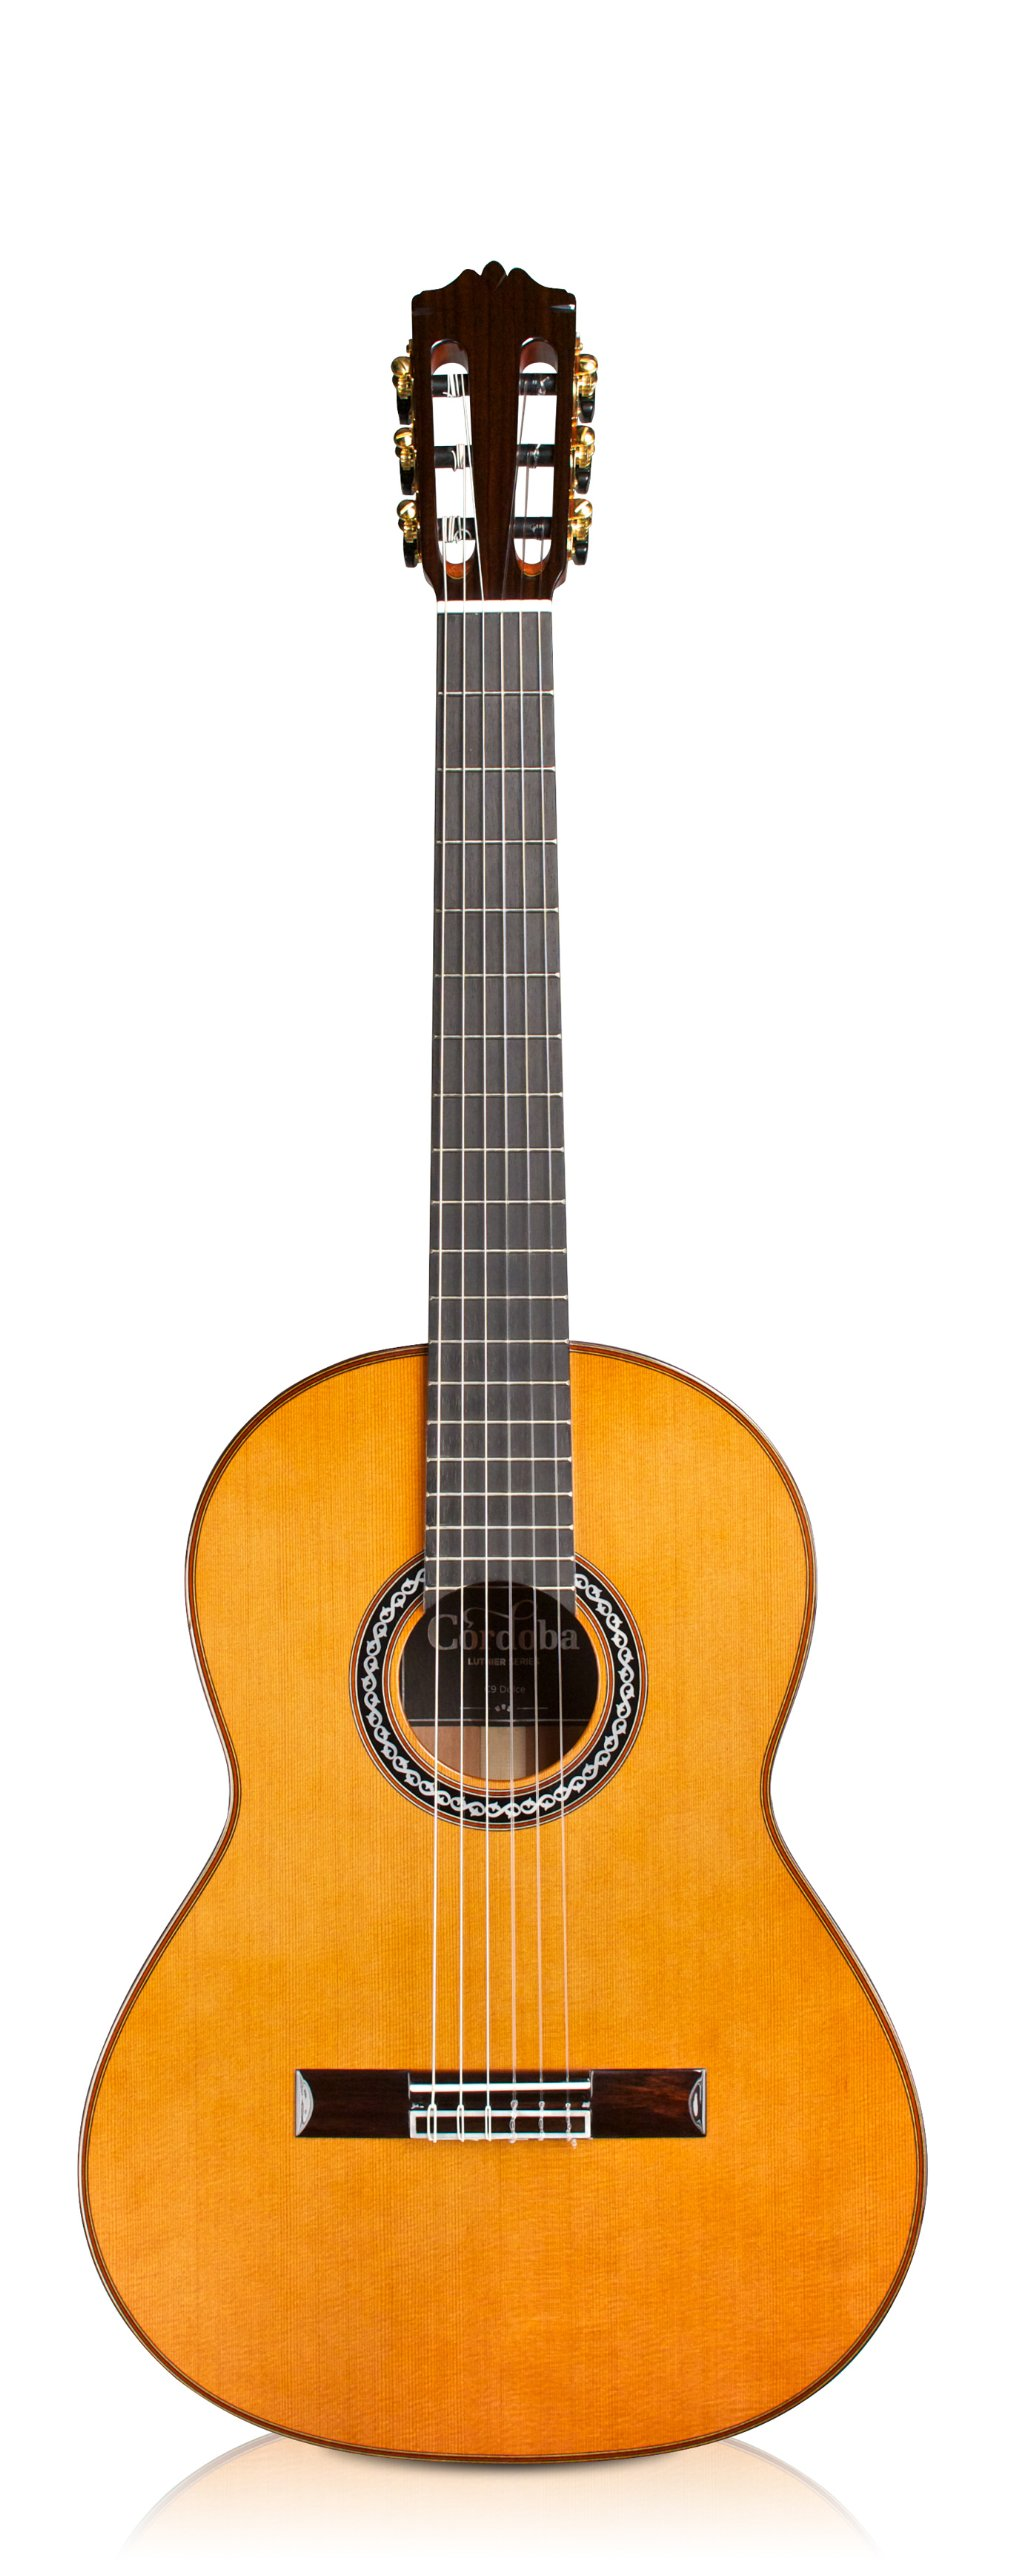 Cordoba C9 Parlor Acoustic Nylon String Parlor Size Guitar